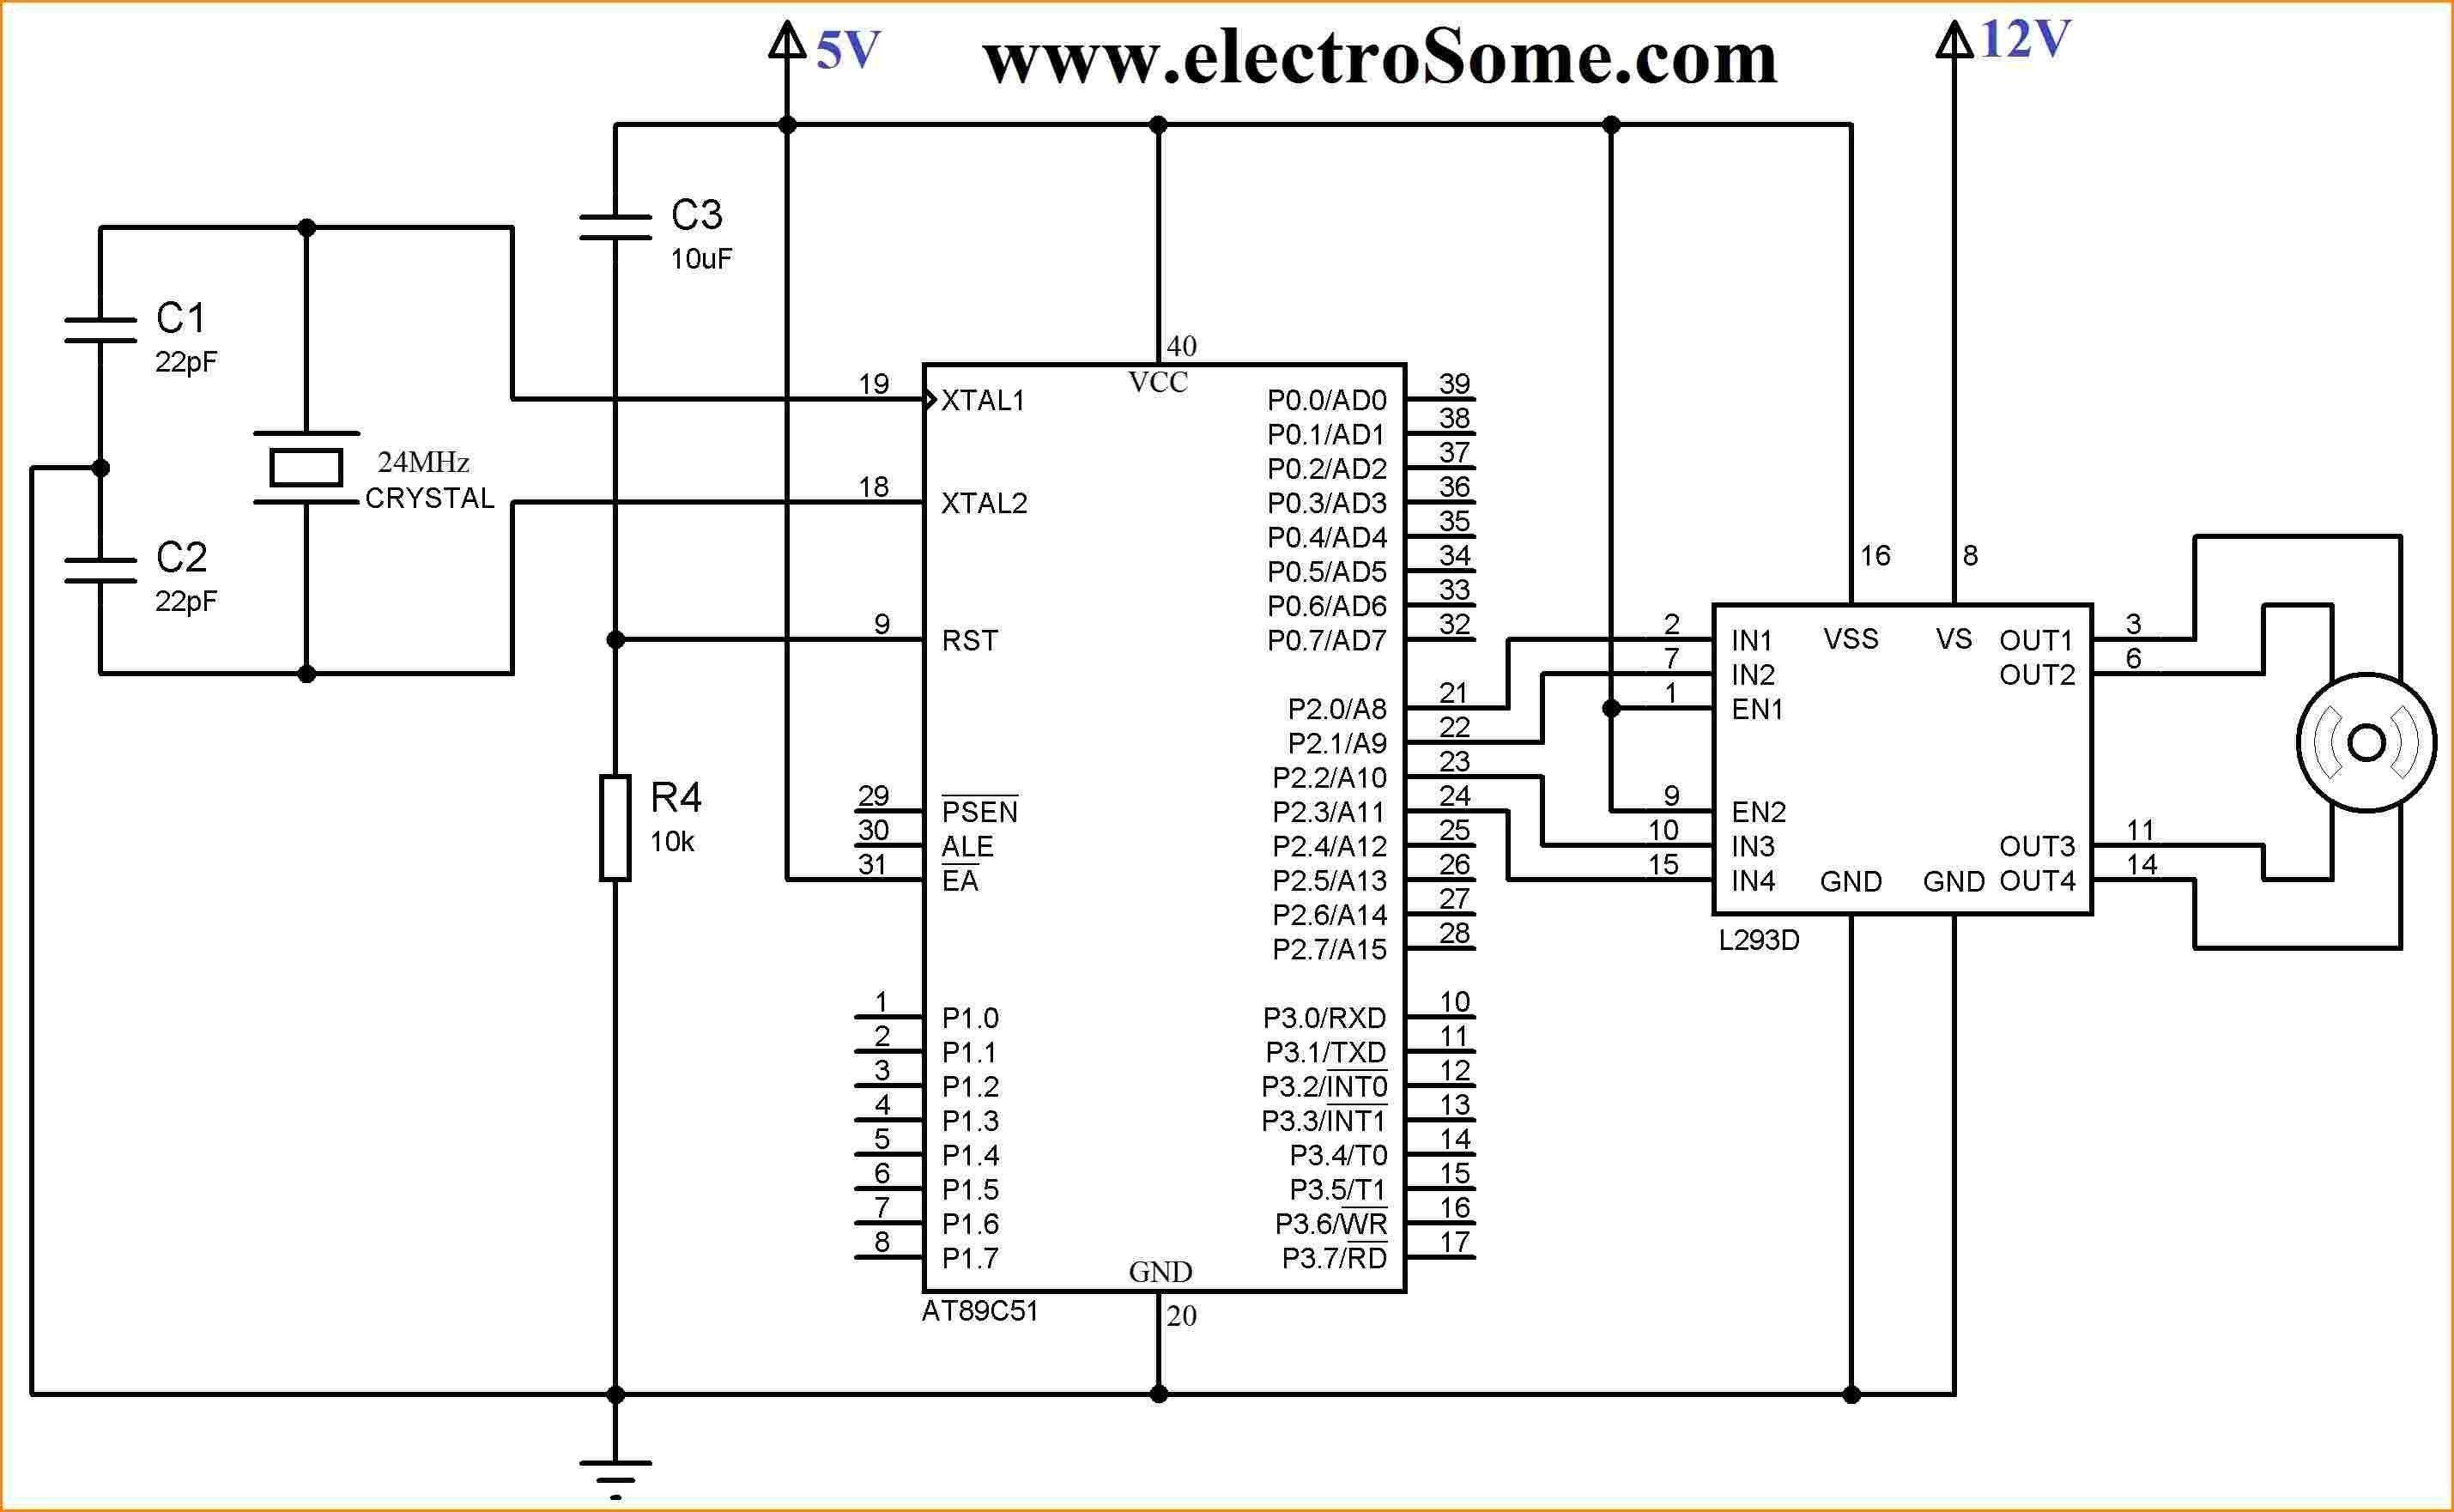 Swann Security Camera N3960 Wiring Diagram Collection Electrical For - Swann N3960 Wiring Diagram